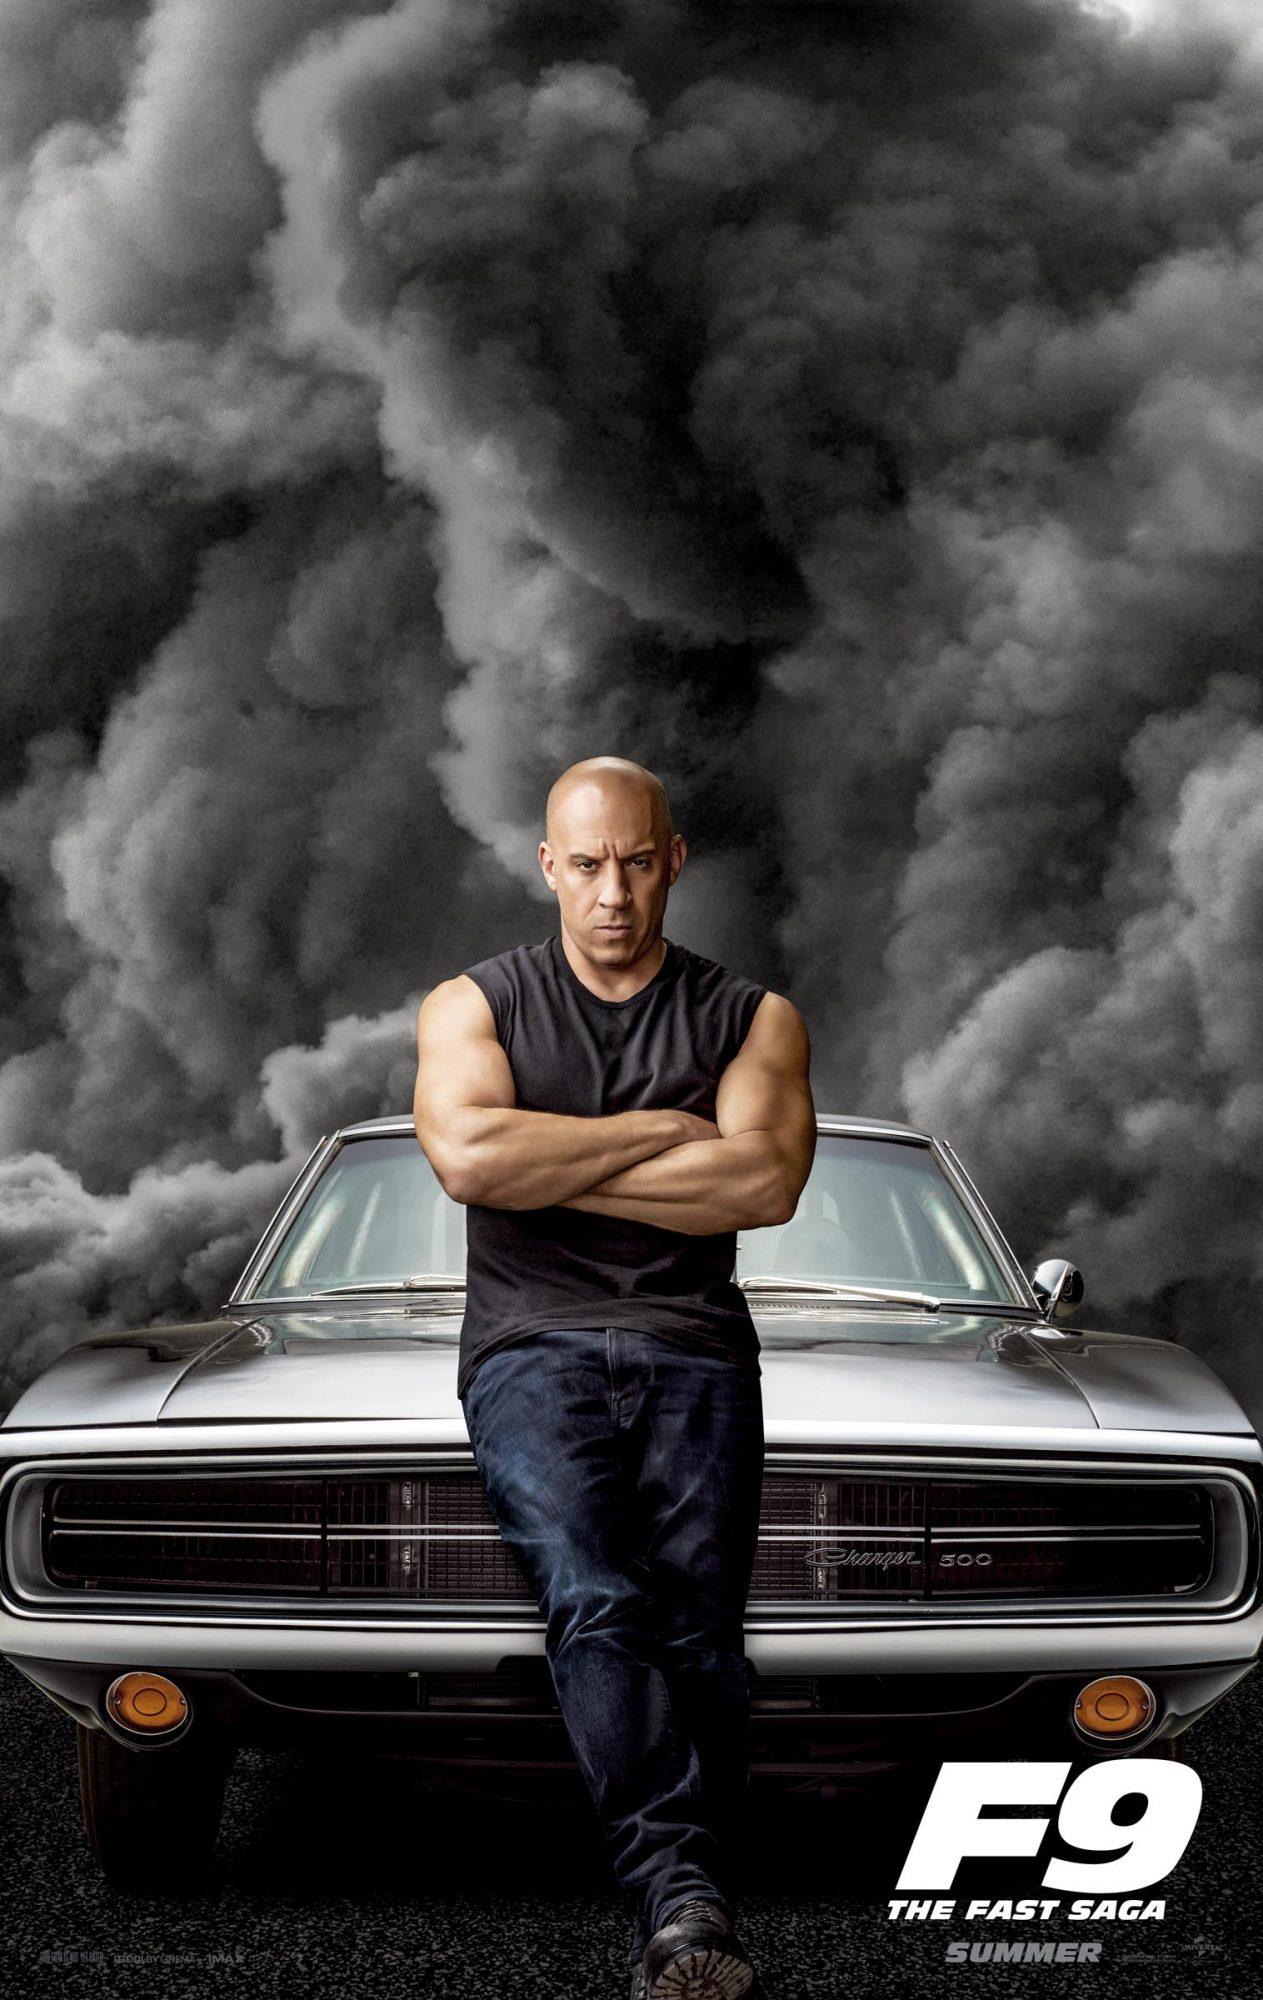 Fast Furious 9 See Vin Diesel John Cena Posters Ew Com